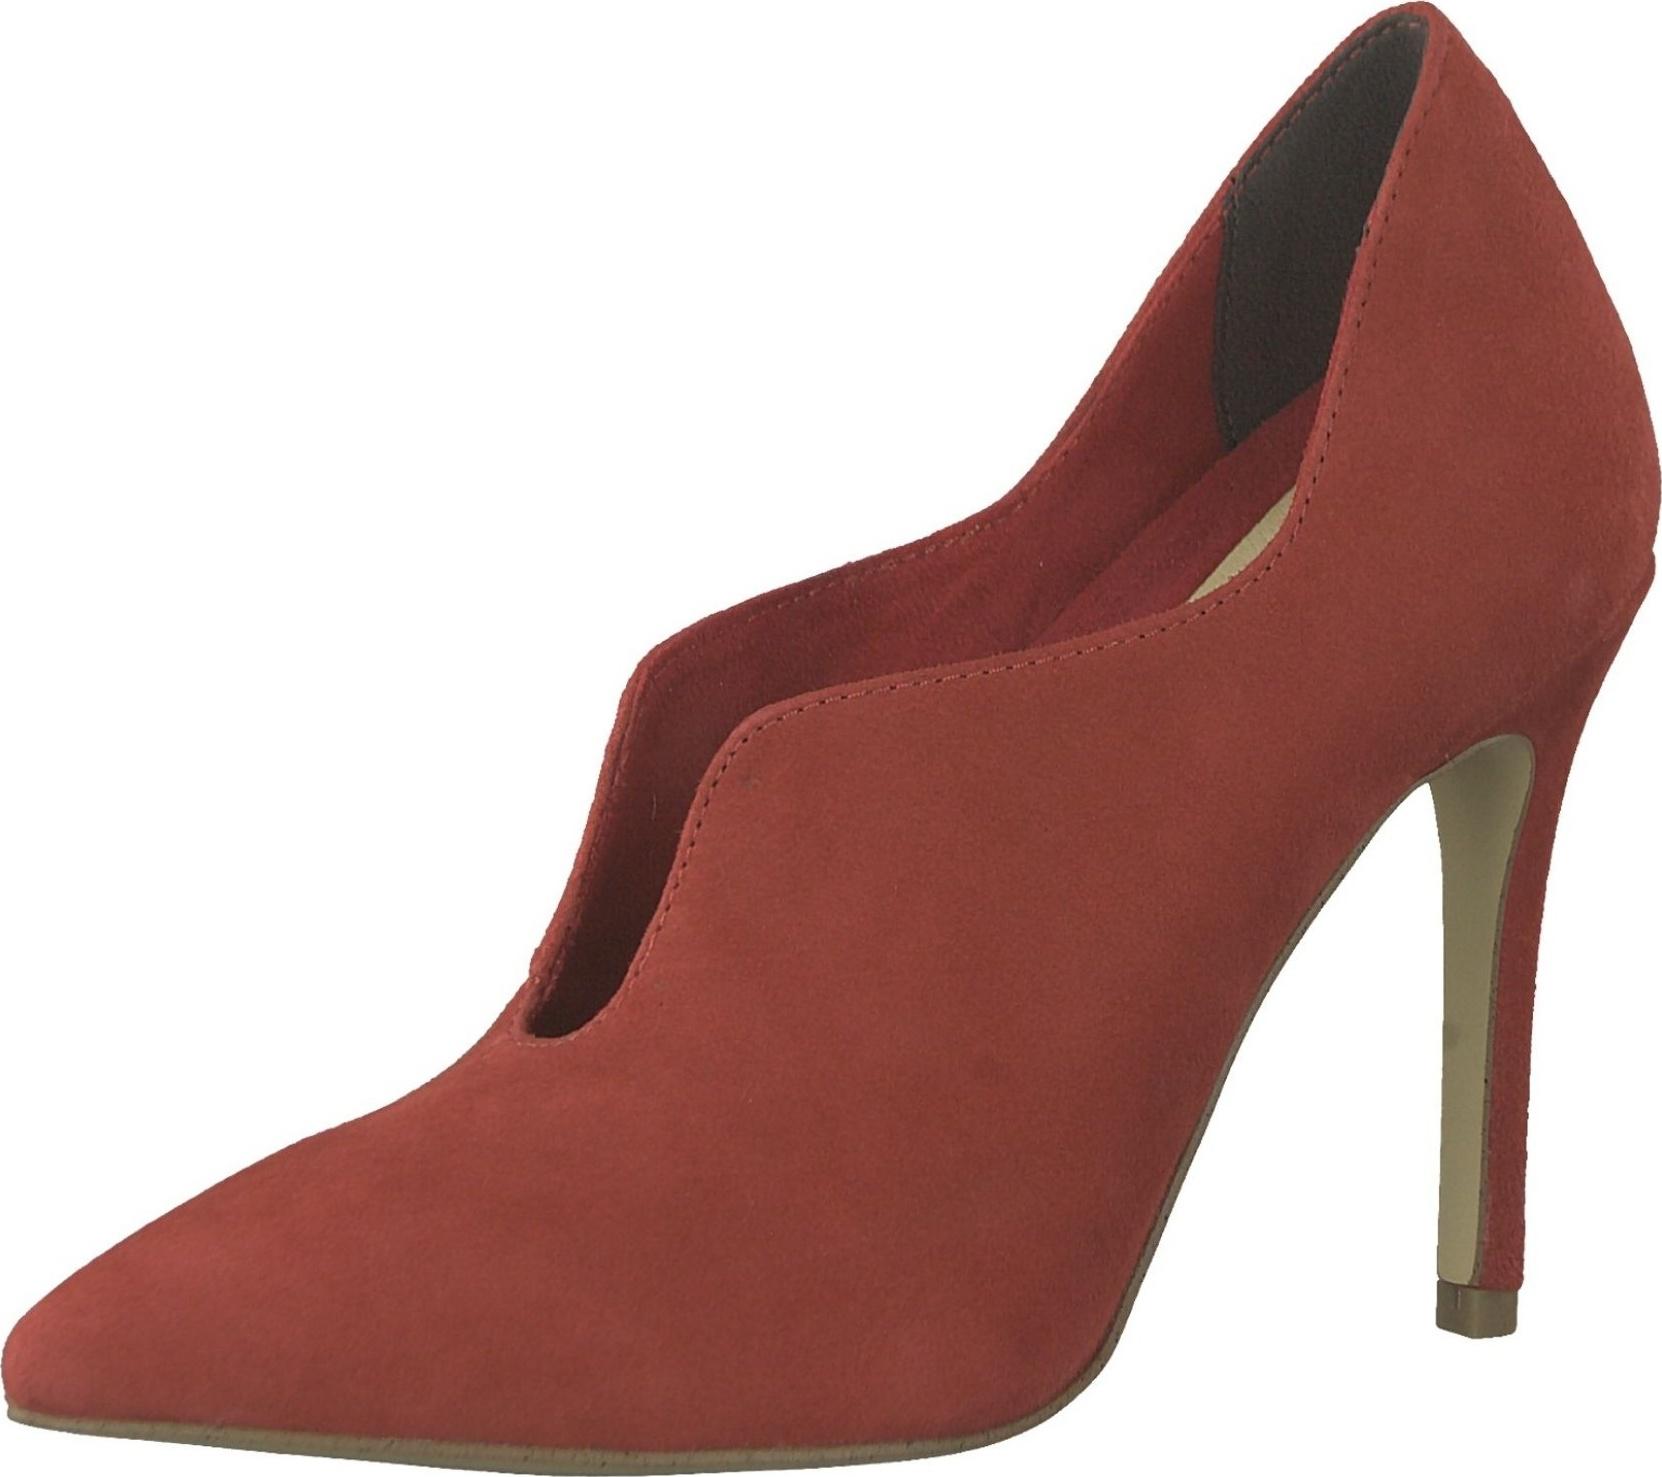 ddbc732740 Dámská bota TAMARIS 1-1-24418-22 CHILI 533 – E-shop Tamaris